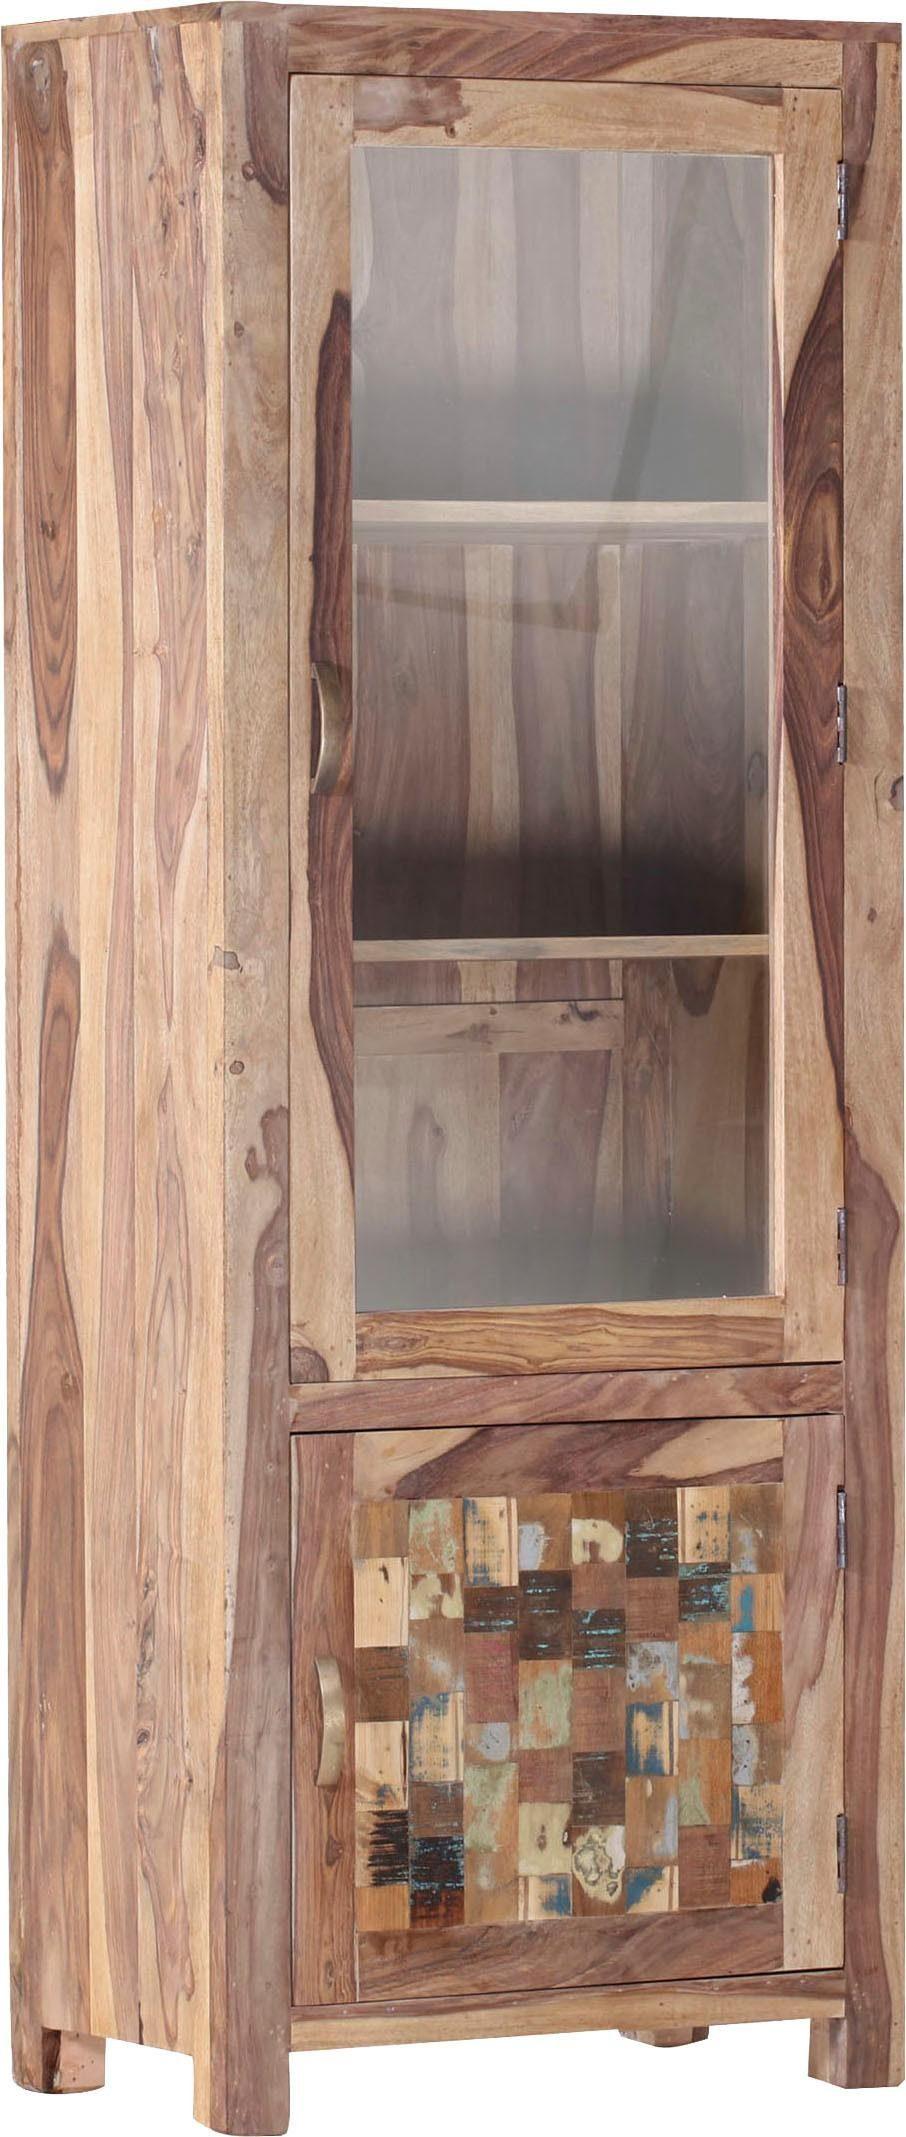 Gutmann Factory Vitrine »Patchwork« aus massivem Sheesham Holz, Höhe 180 cm